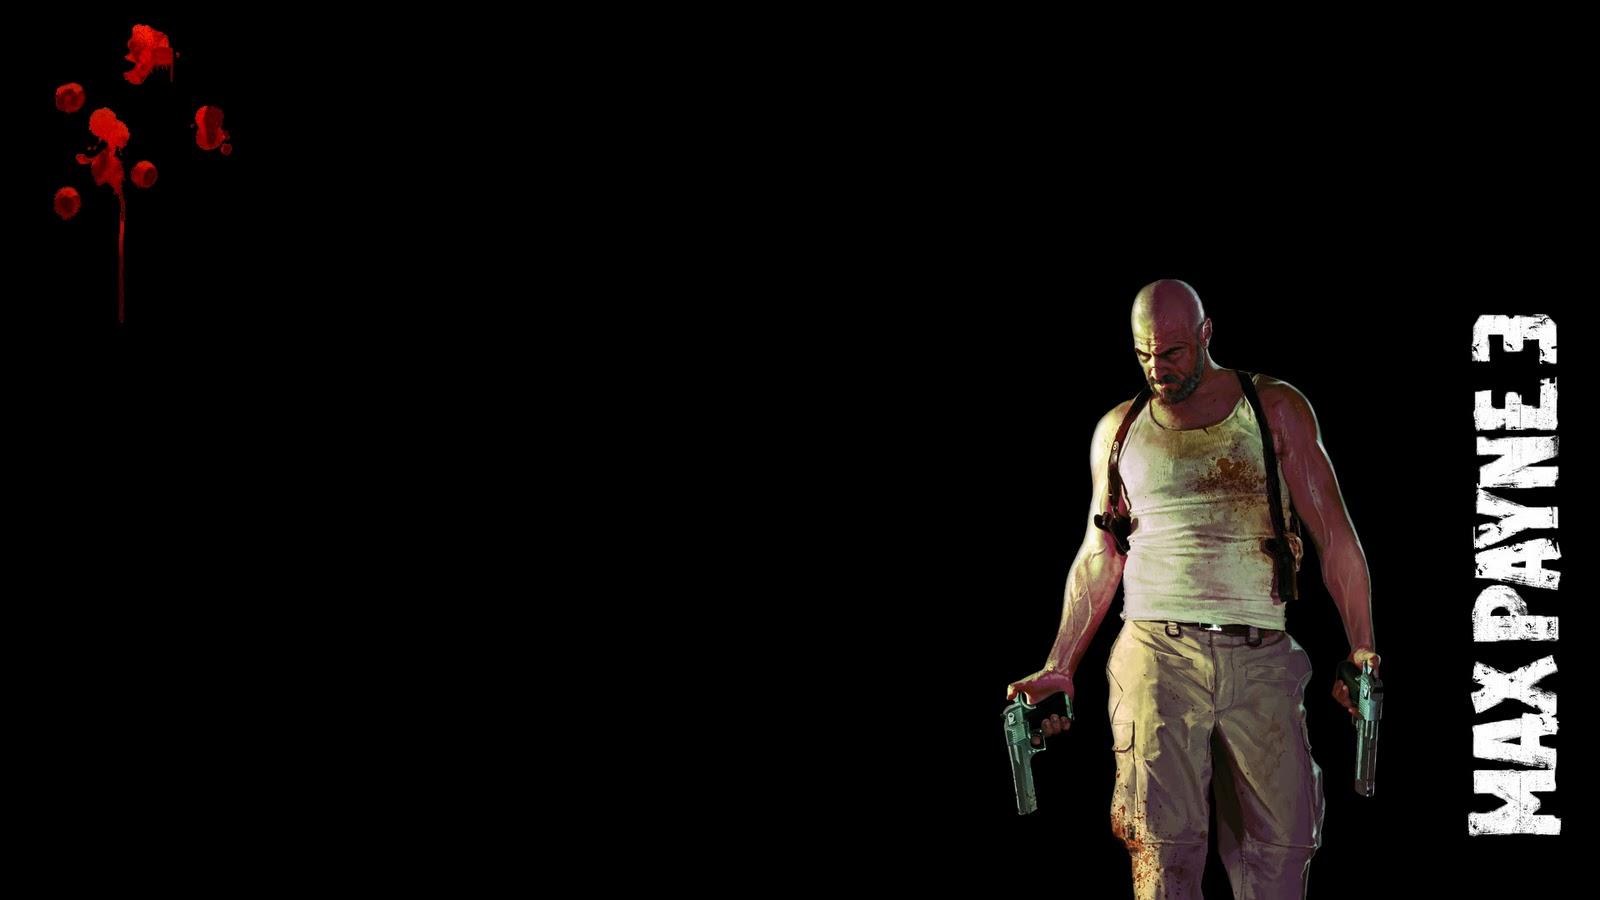 Max Payne 3 Release Date Full Review Trailer Wallpaper